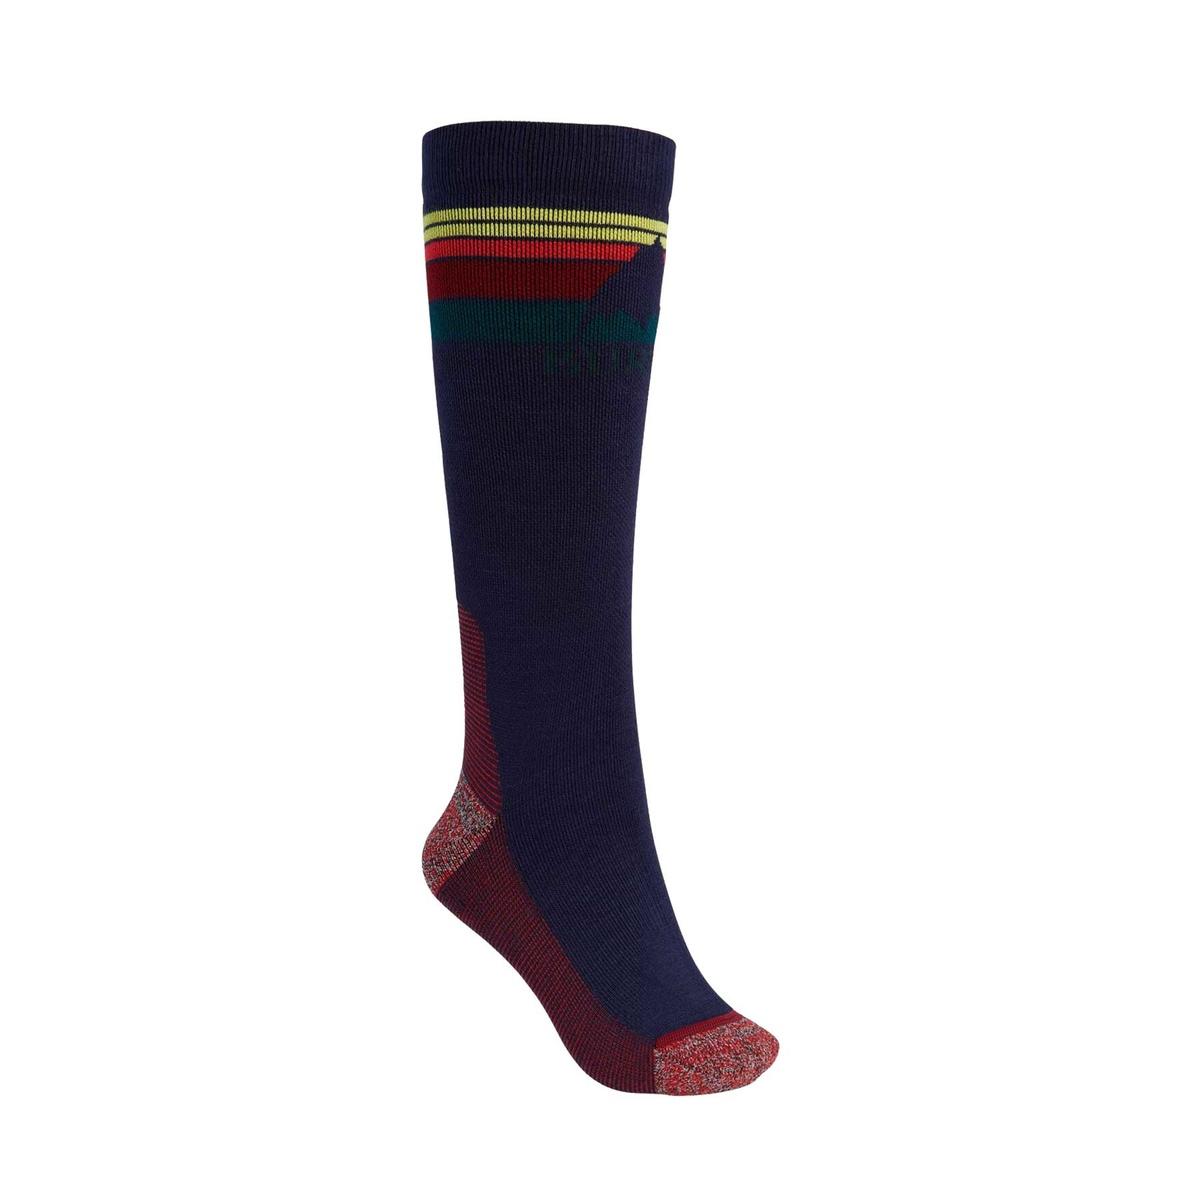 Prezzi Burton calze emblem mdwt donna